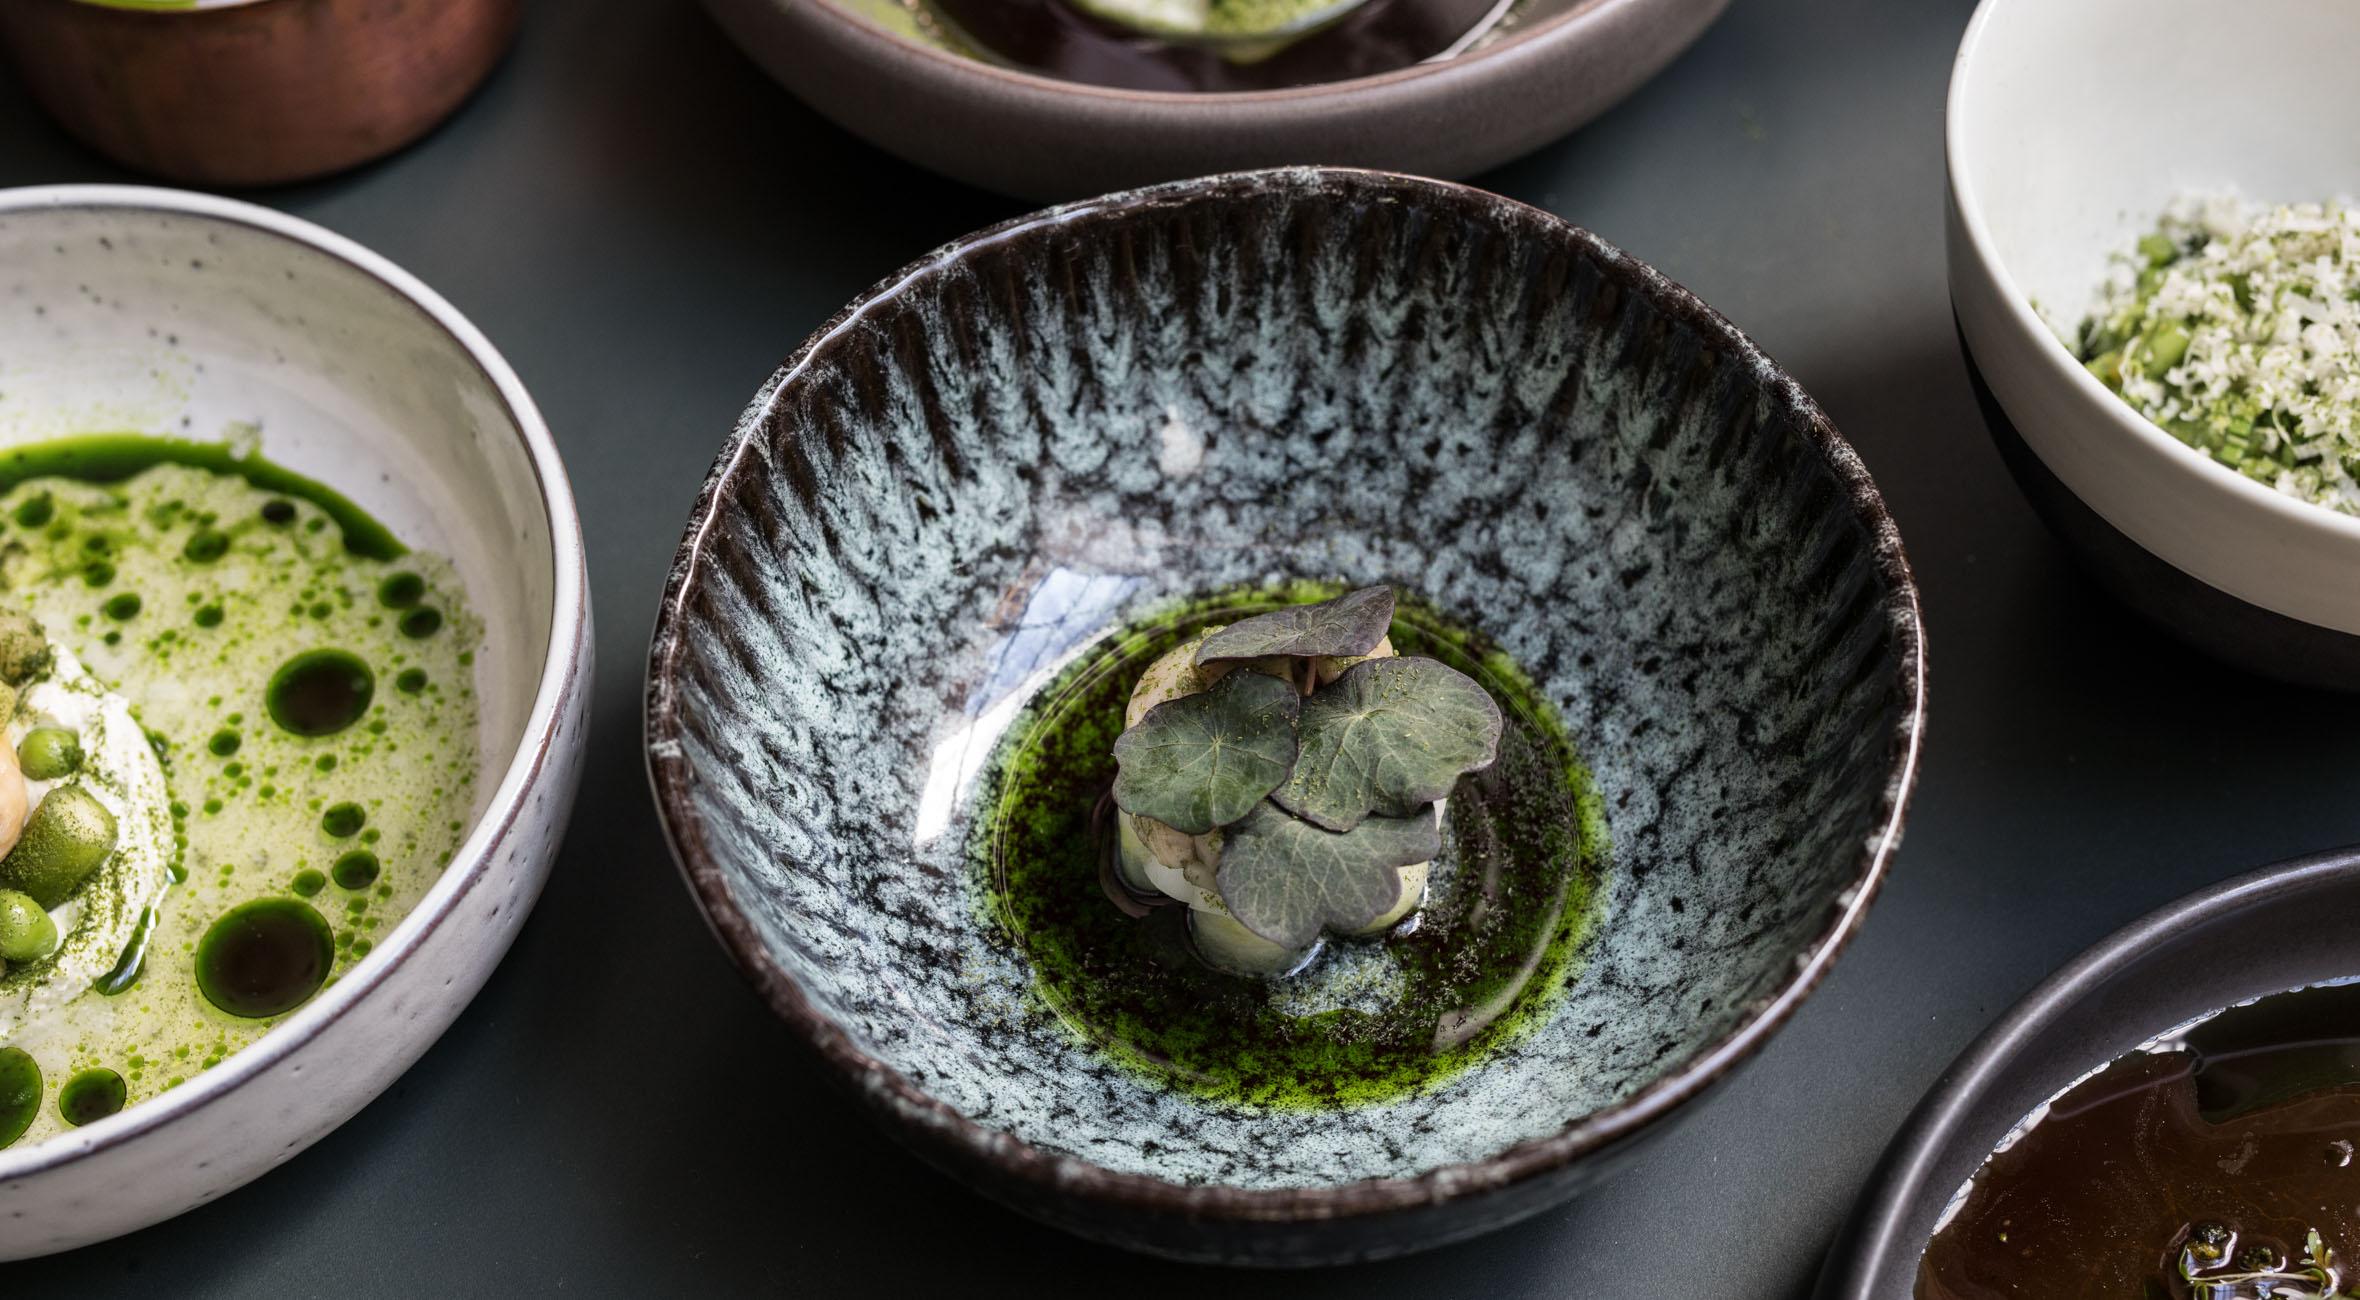 5-retters menu hos Restaurant Meille i Indre By – Nordisk gourmet-restaurant har tidligere Michelin-kokke i køkkenet